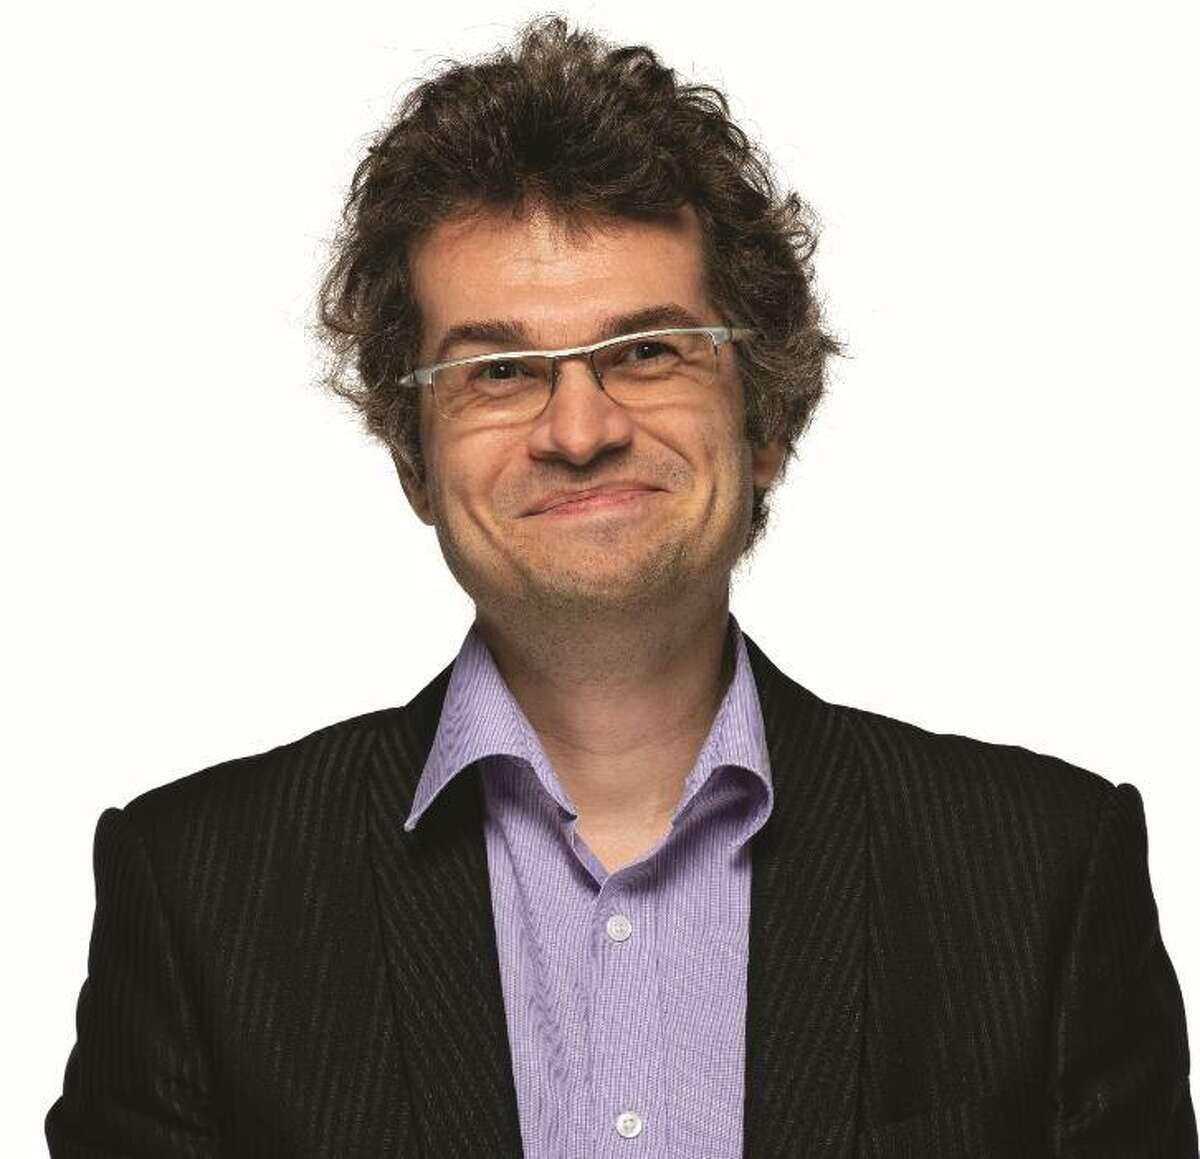 Jeremi Bigosinski